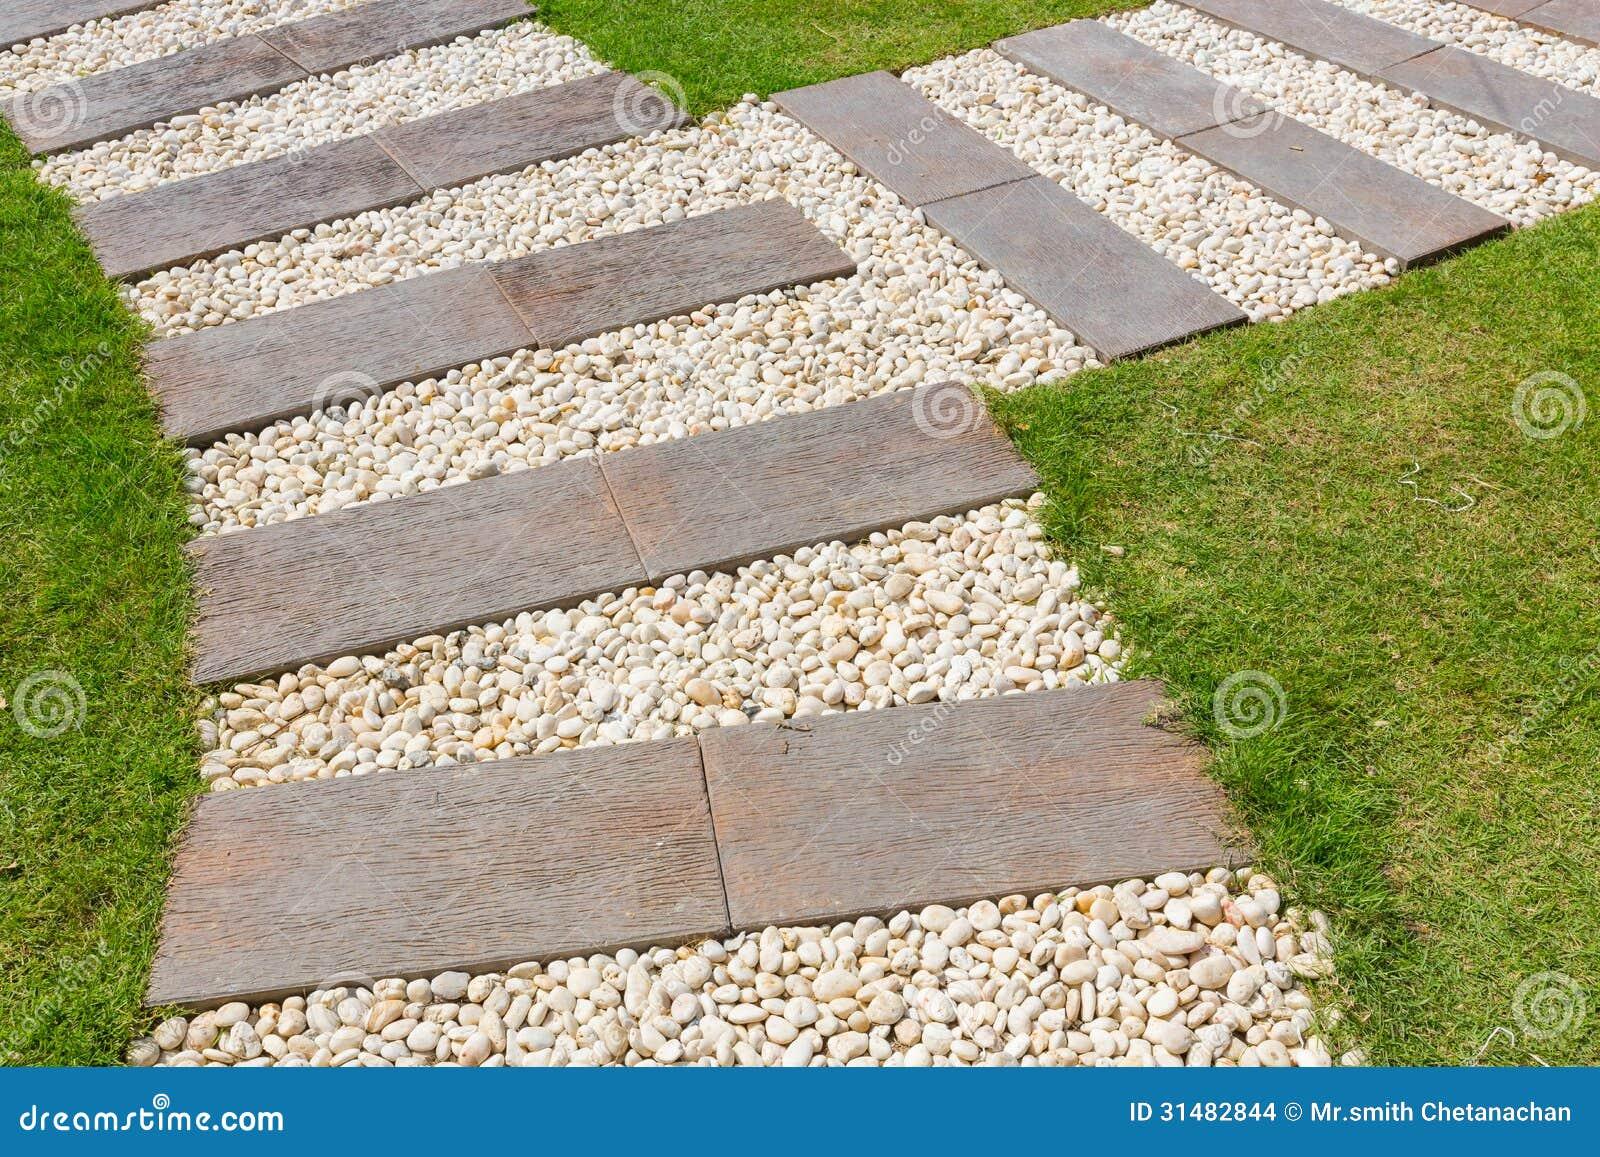 banco de jardim vetor:Steinweg Im Garten Stockbilder – Bild: 31482844